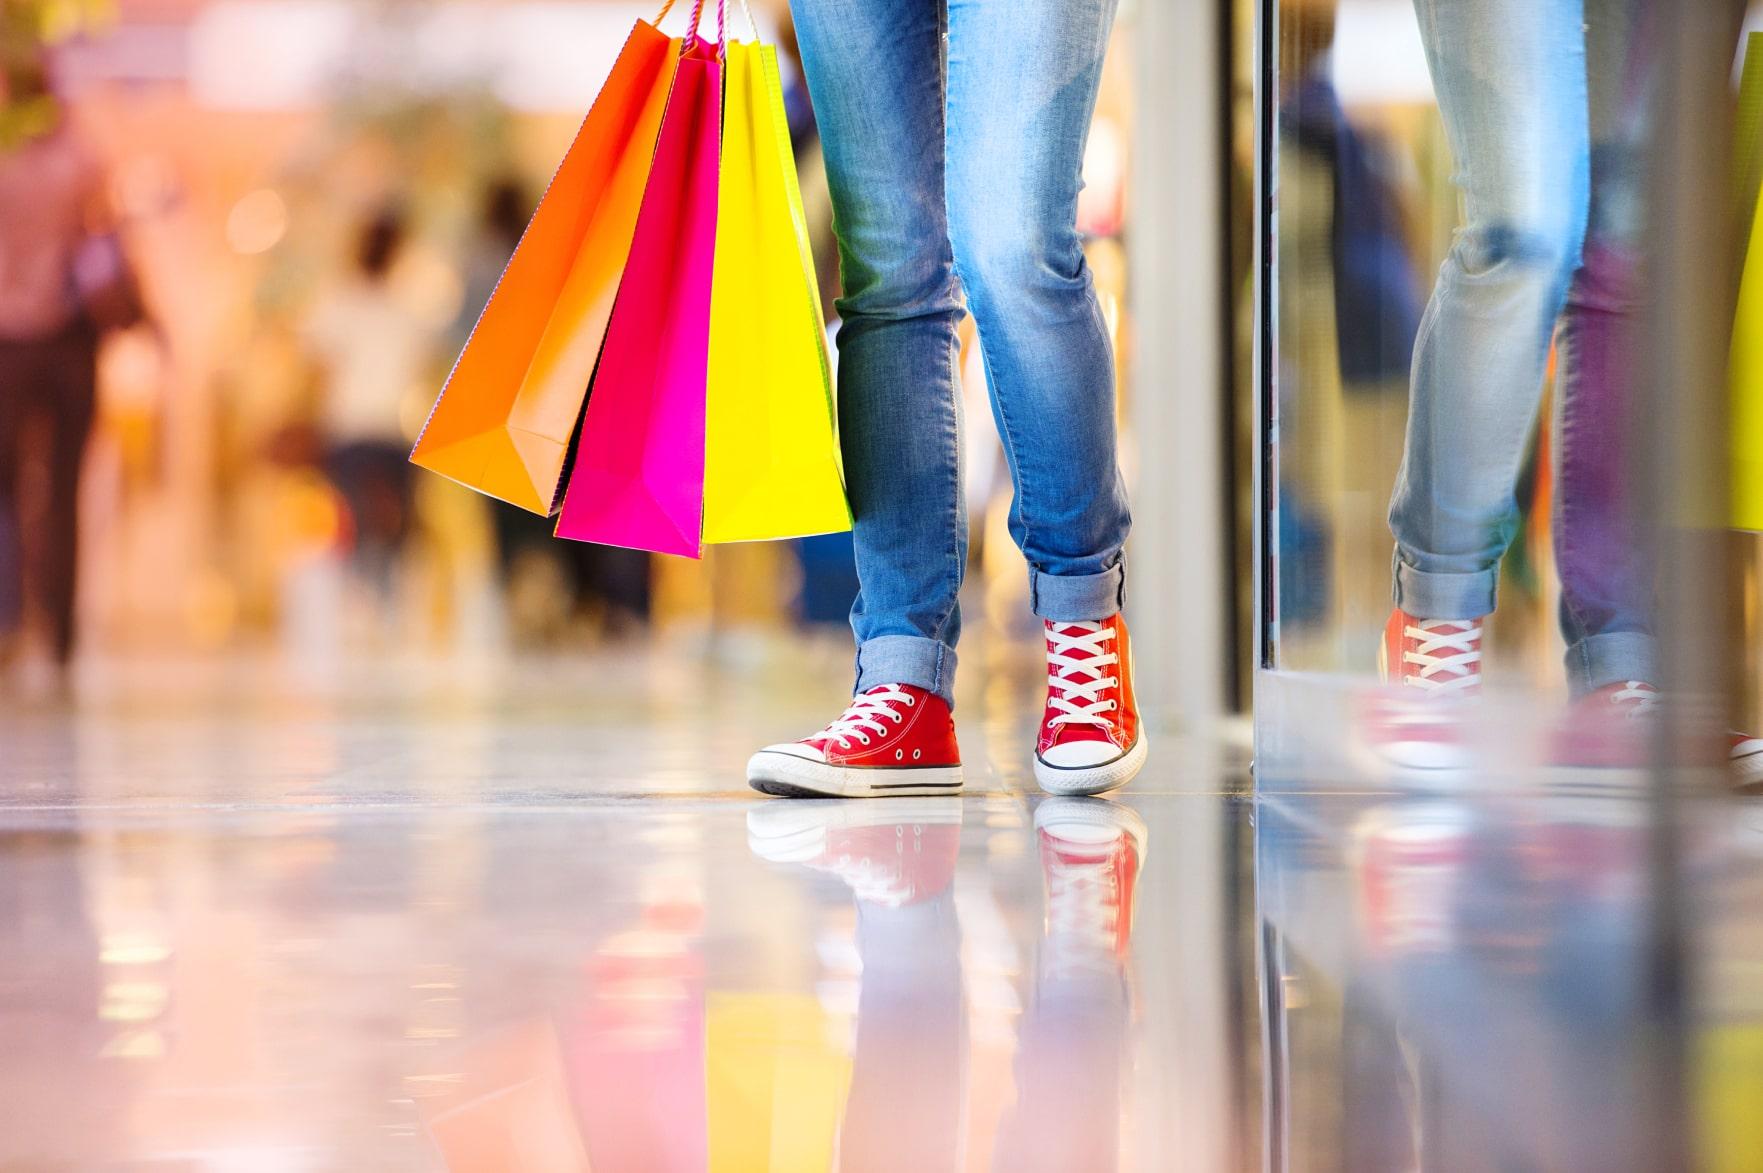 shopping-bags-inside-mall